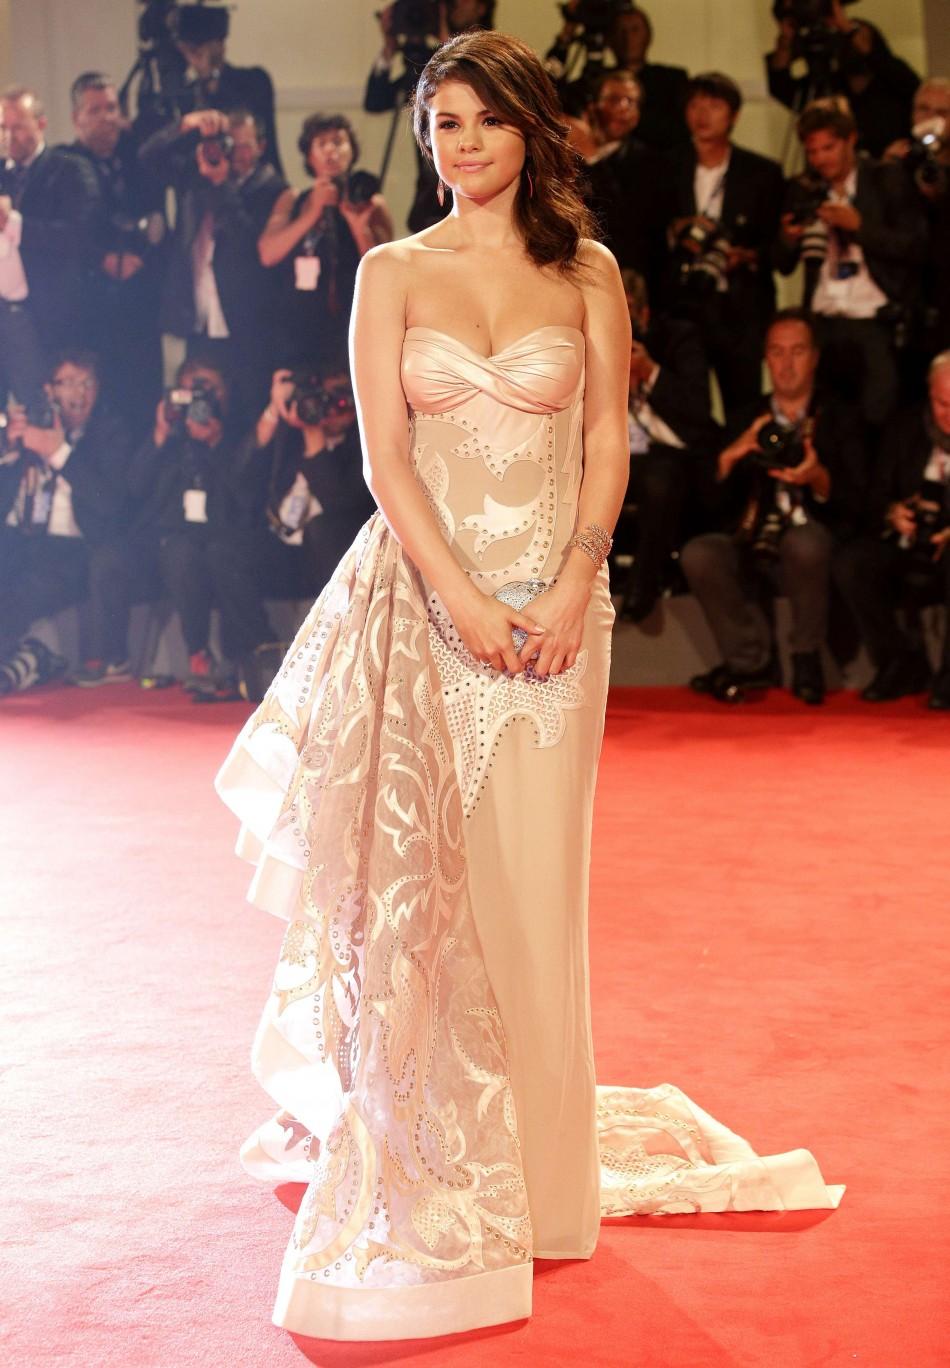 Venice International Film Festival Selena Gomez Stuns Red